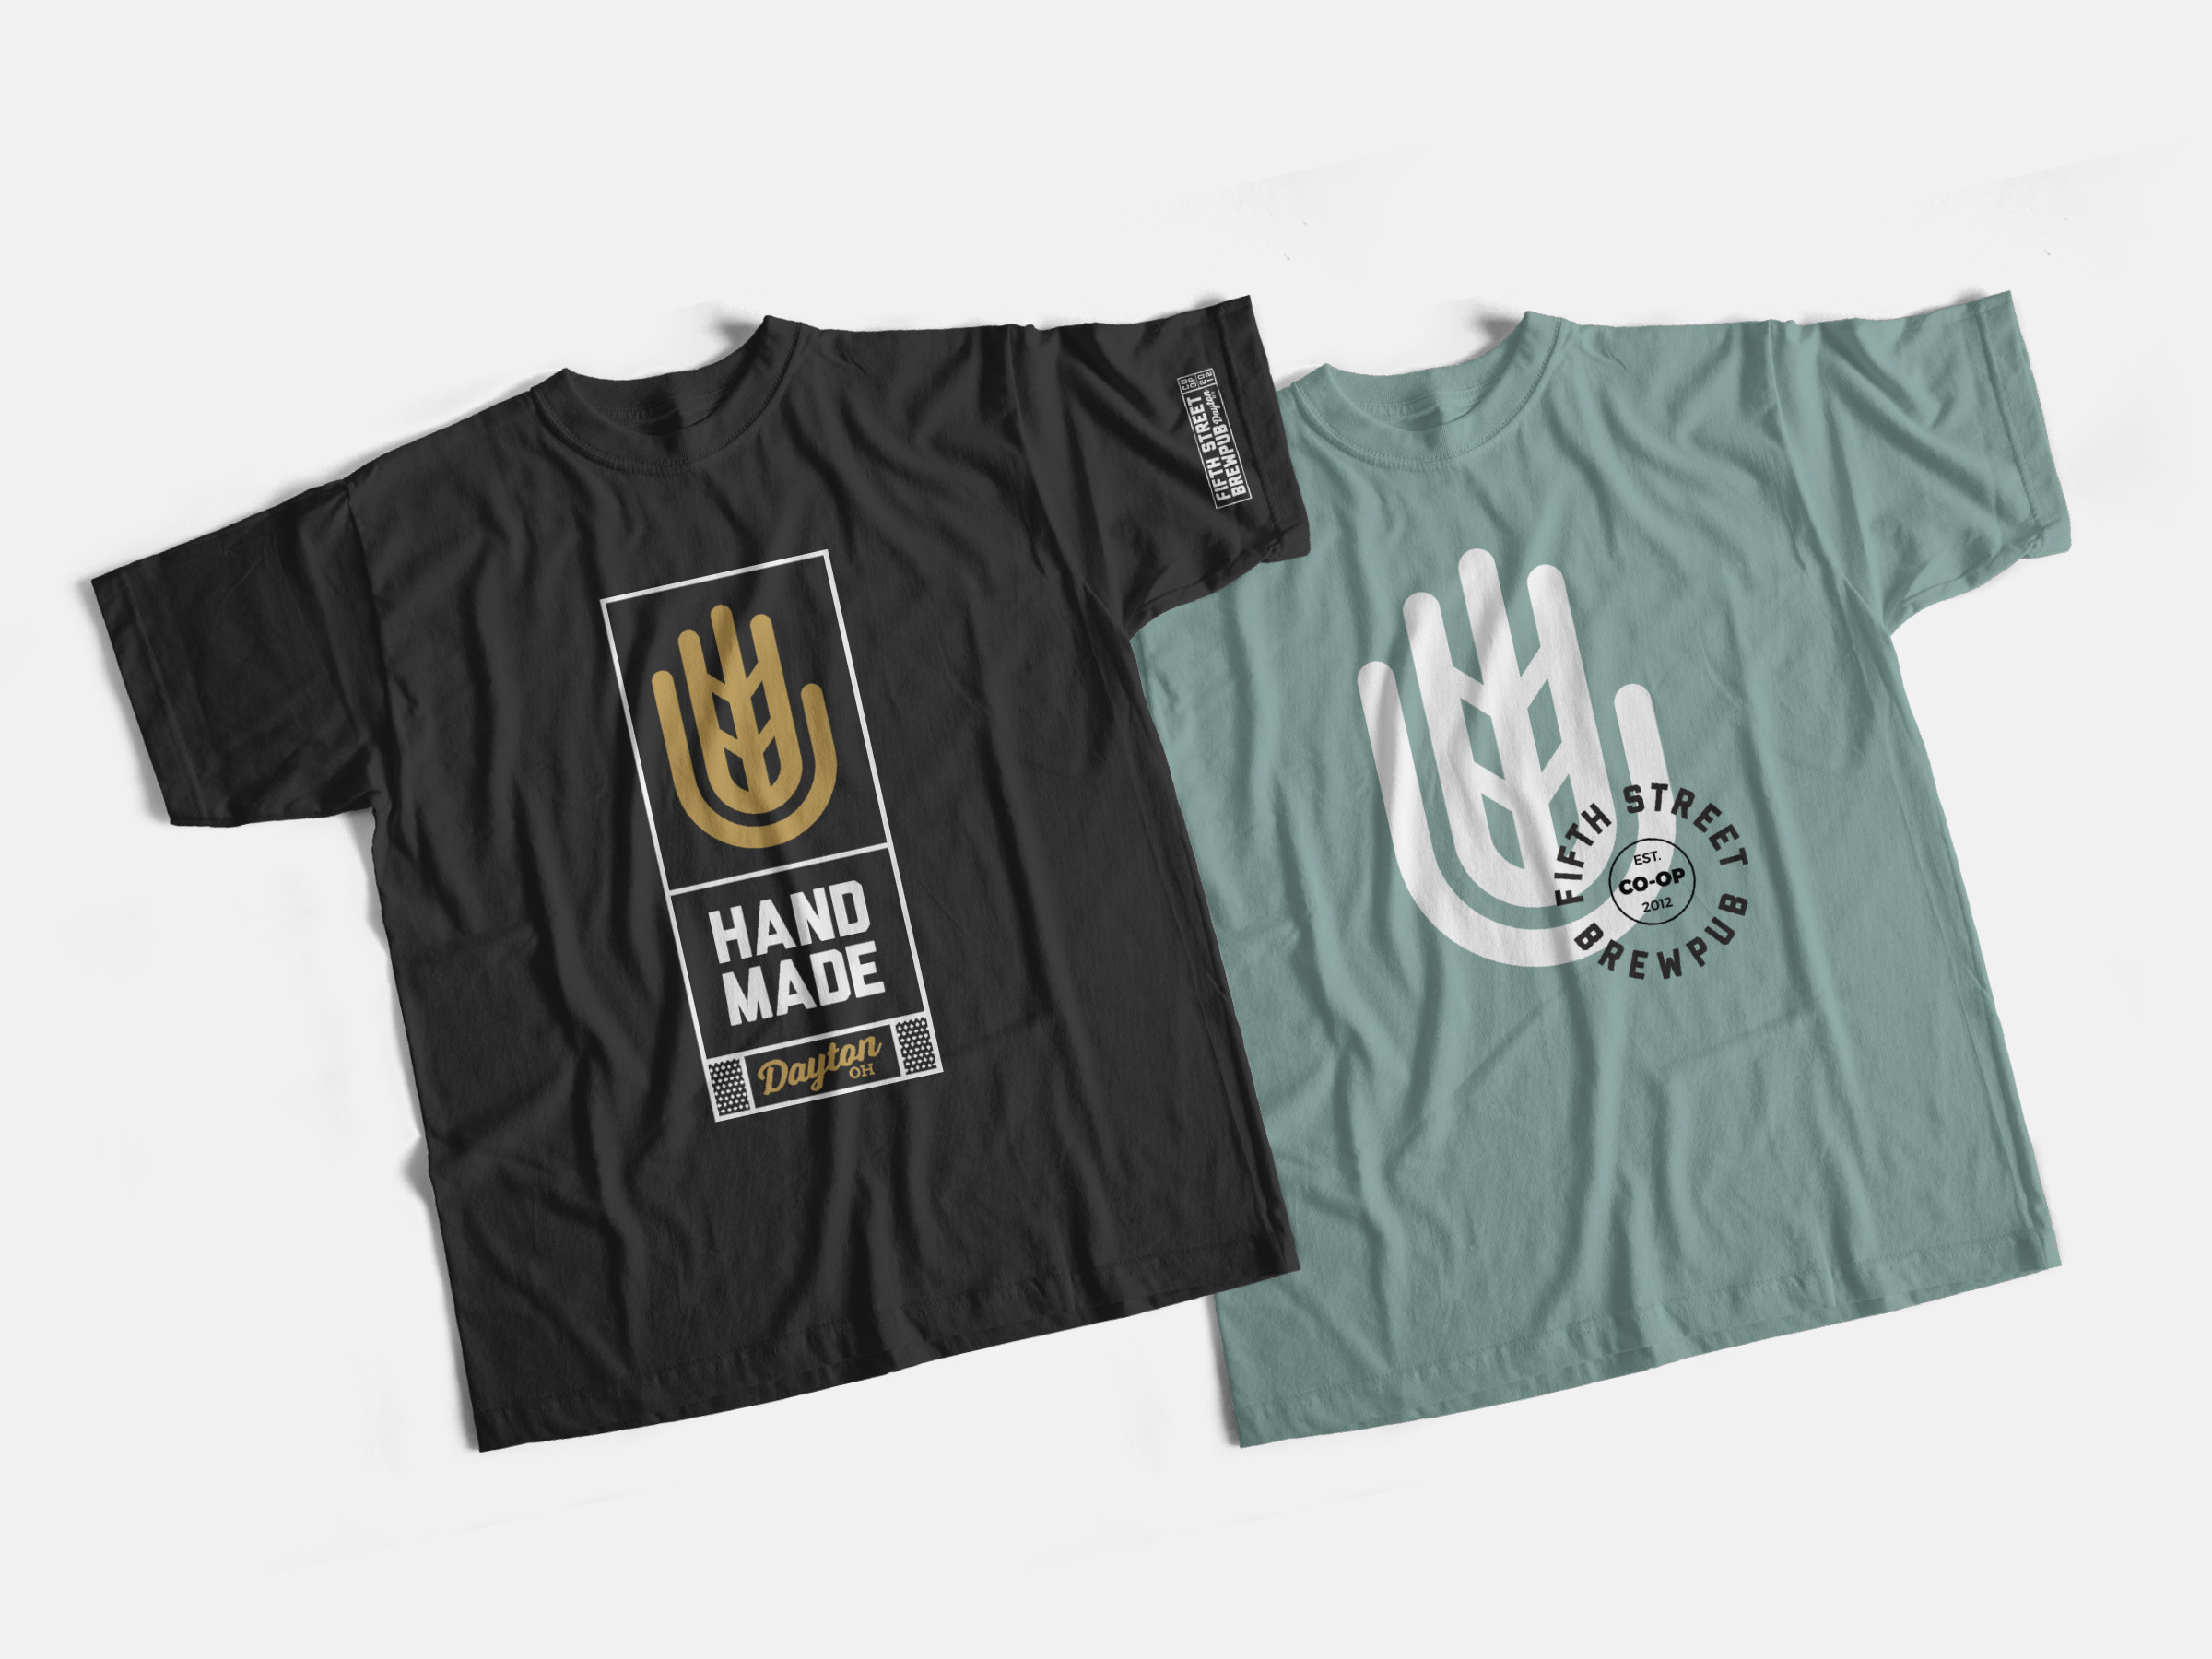 FSB-Shirts